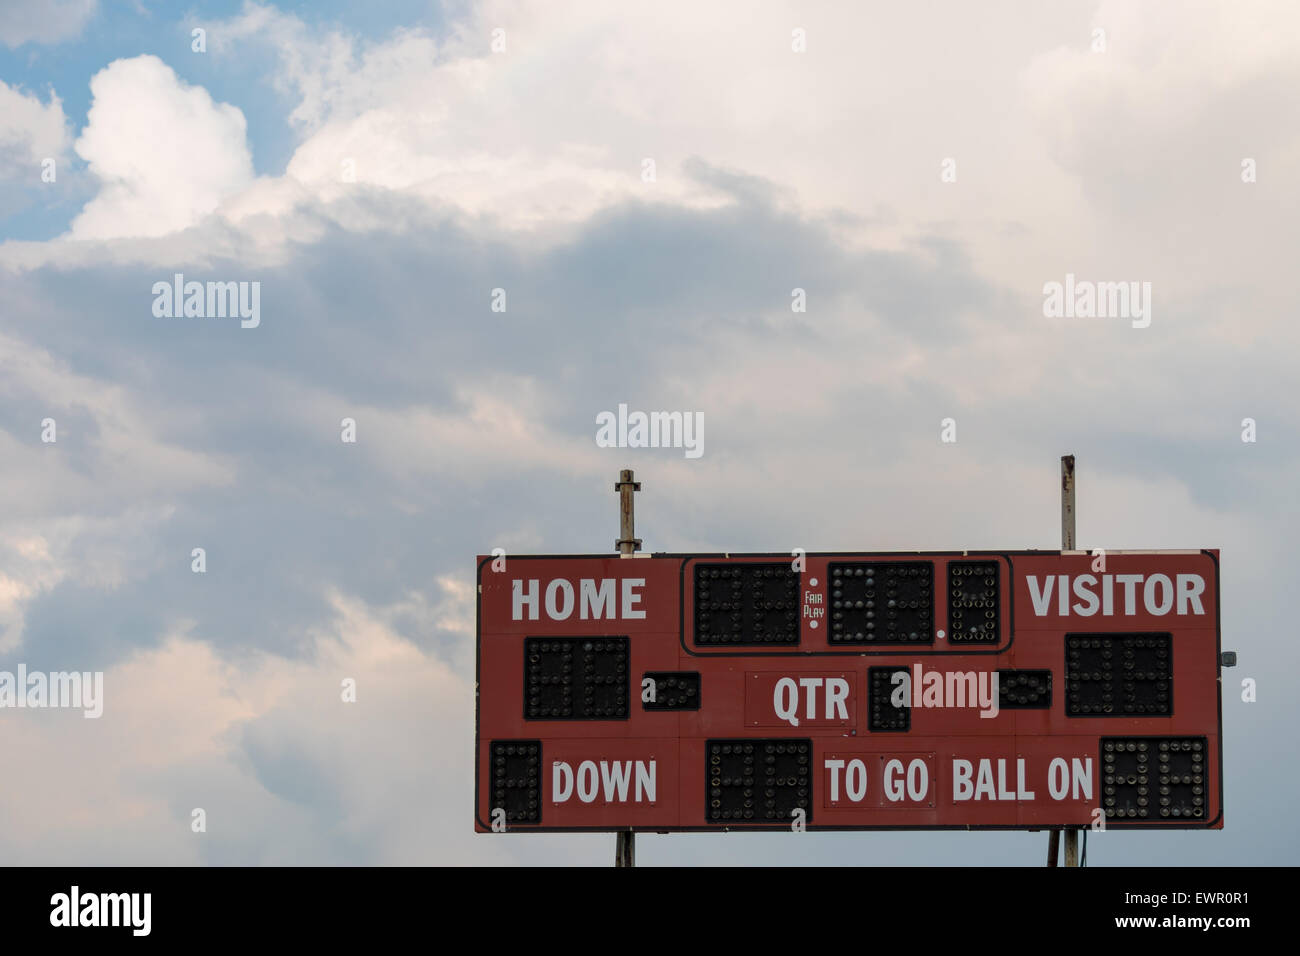 Vintage Red Football Stadium Scoreboard